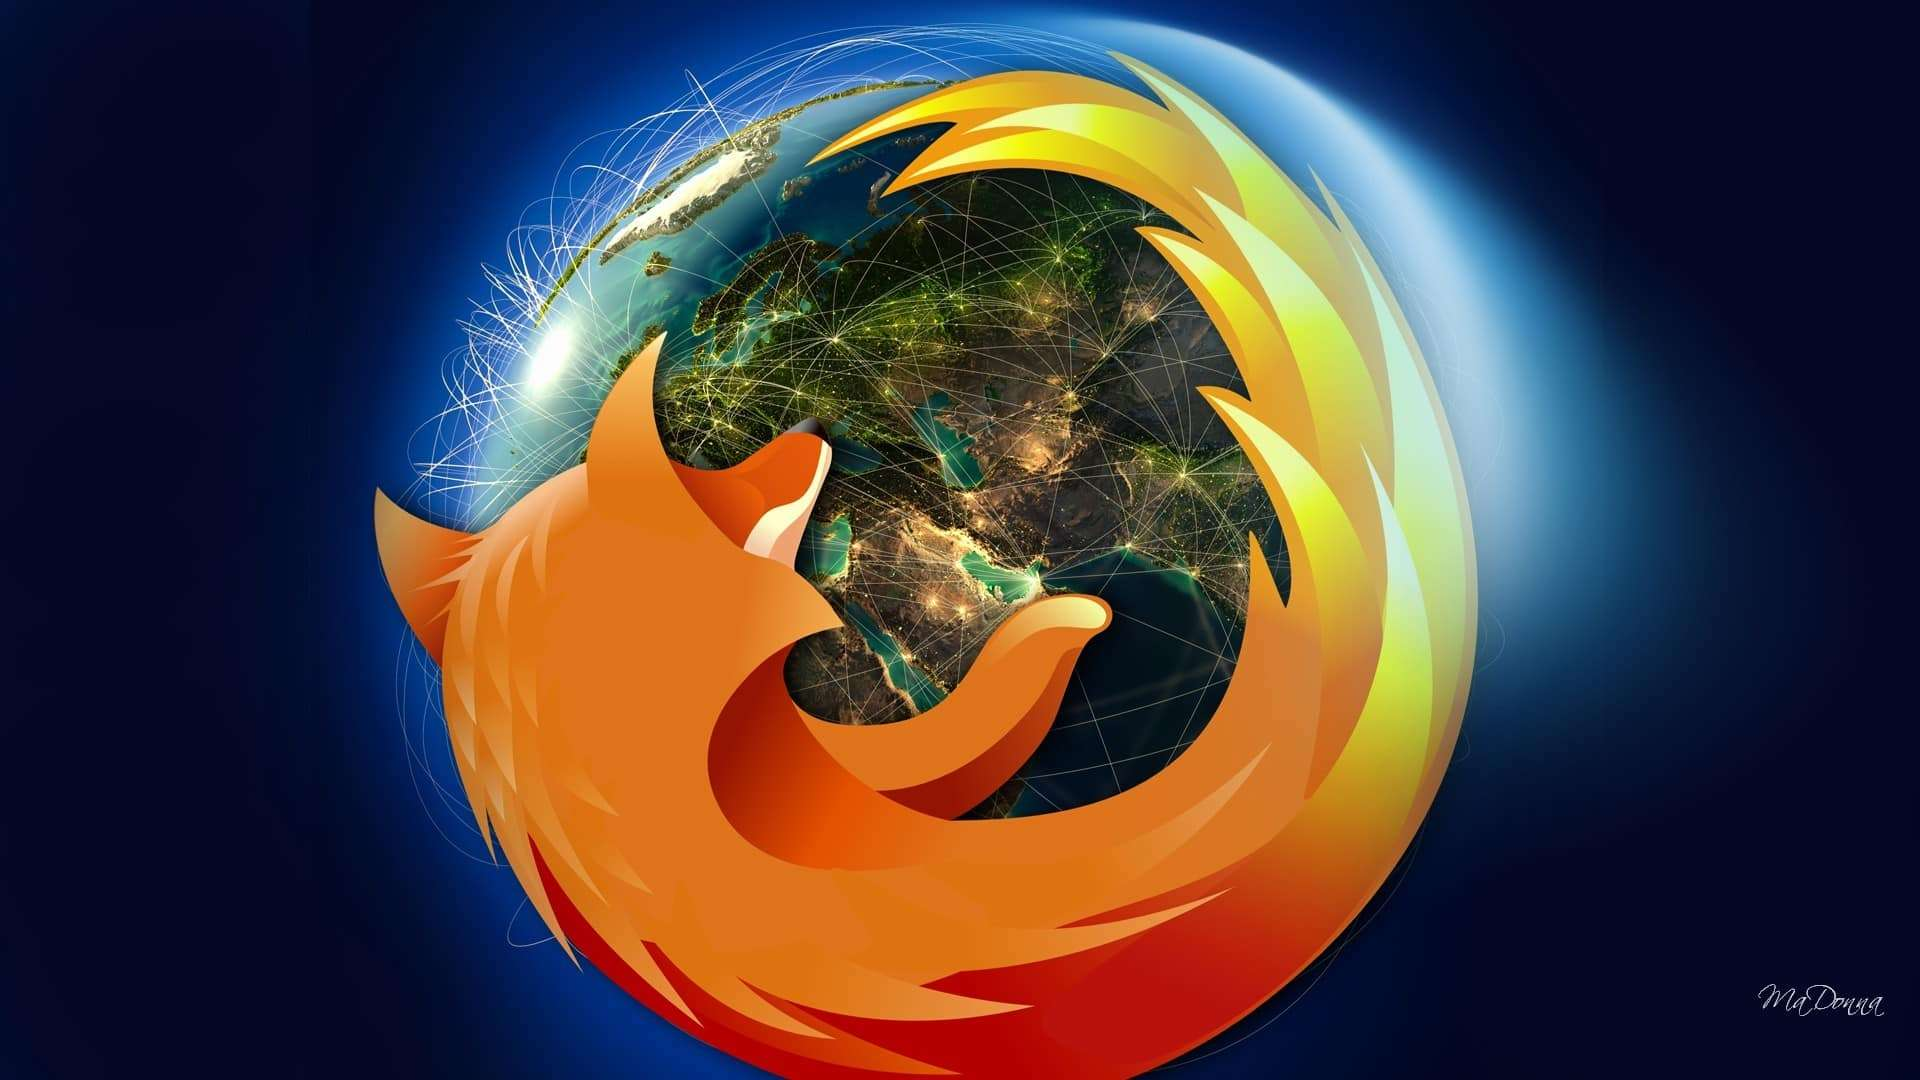 Браузер Mozilla Firefox станет платным: ближе к своим клиентам и их желаниям